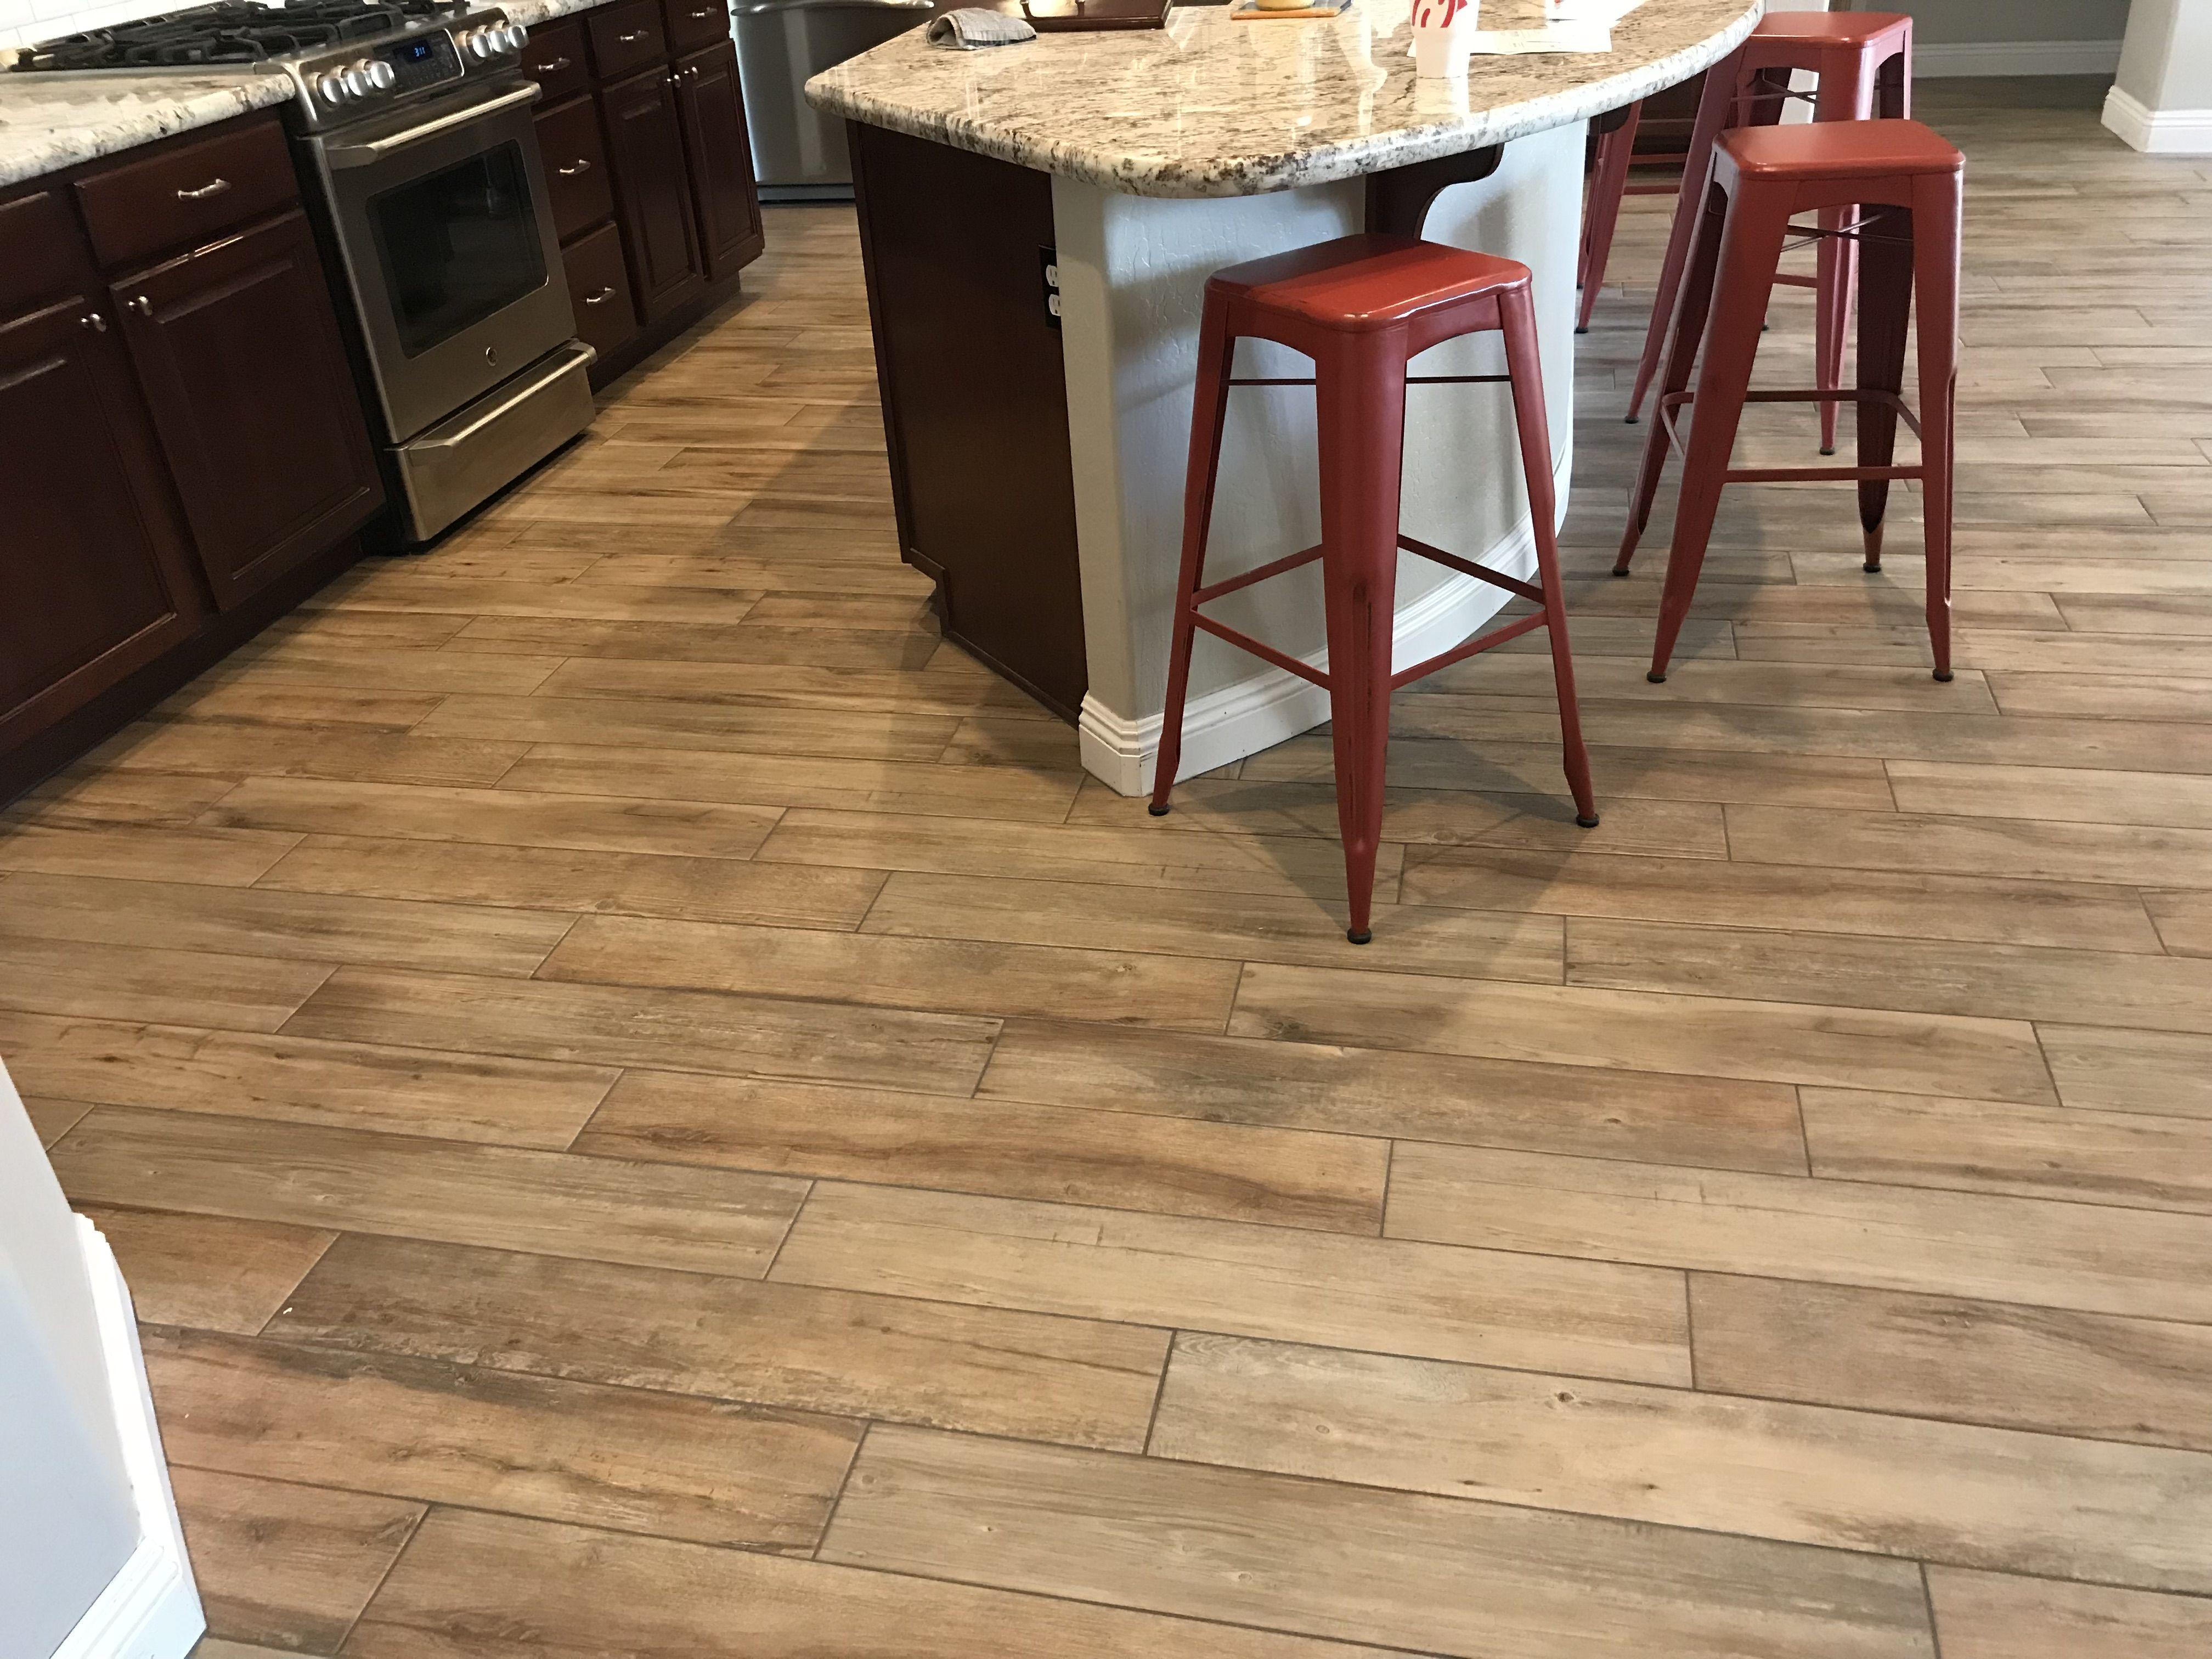 Magnolia Bend Natural Driftwood 6x36 Porcelain Tile Porcelain Tile Woodlooktile Woodtile Woodlook Flooring Wood Look Tile Flooring Contractor